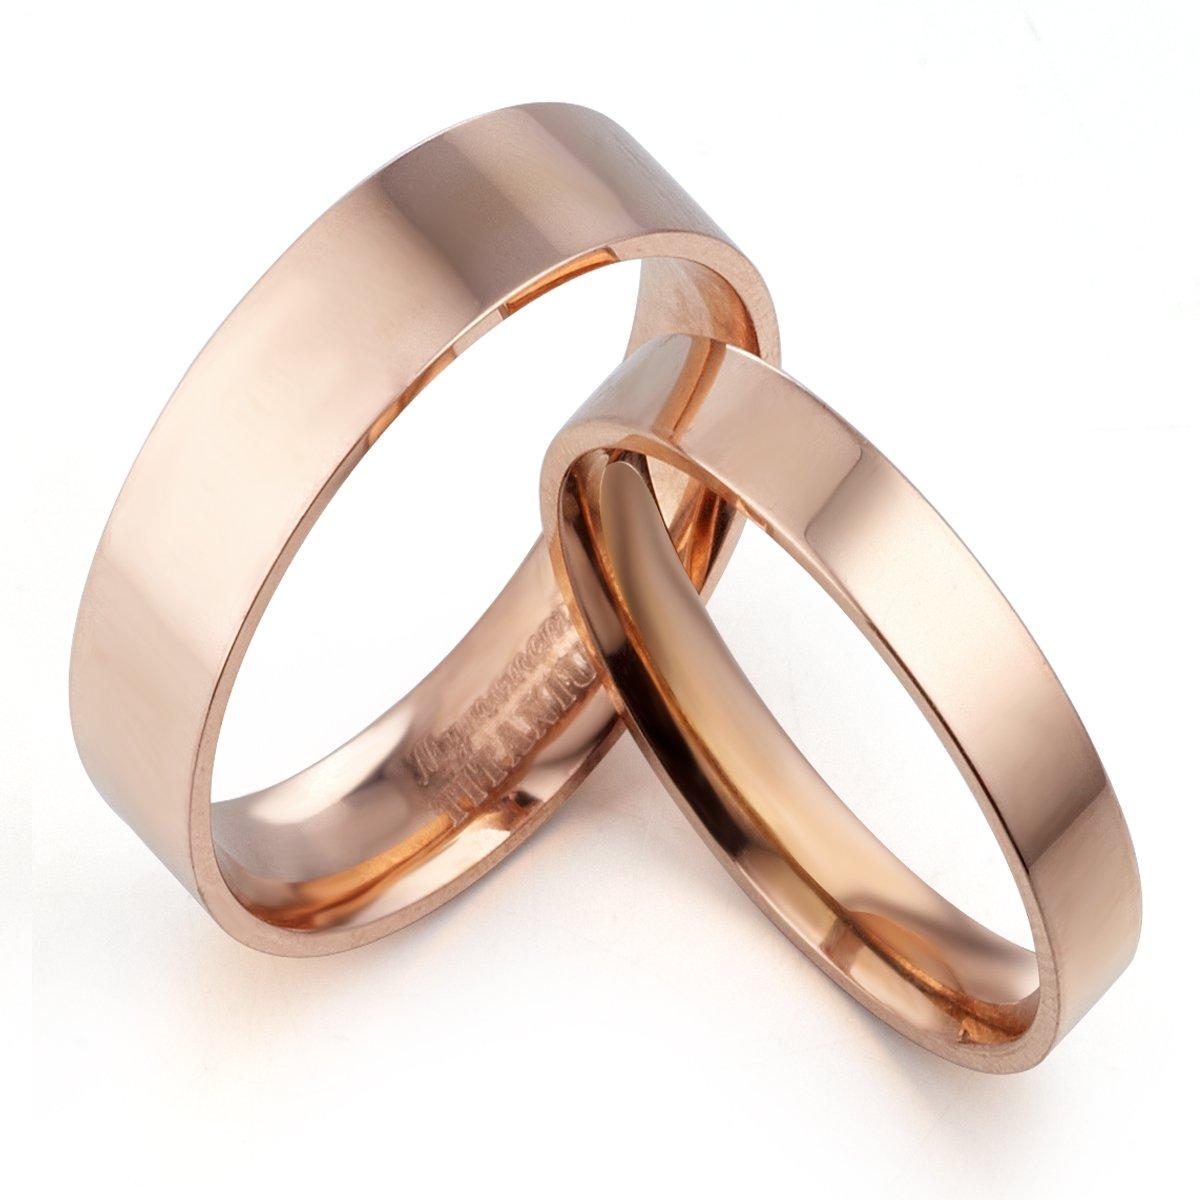 14.5 Women Ring Size 10.5 Gemini Groom /& Bride Flat Court Comfort Fit Rose Gold Titanium Wedding Rings Set Width 6mm /& 4mm Men Ring Size